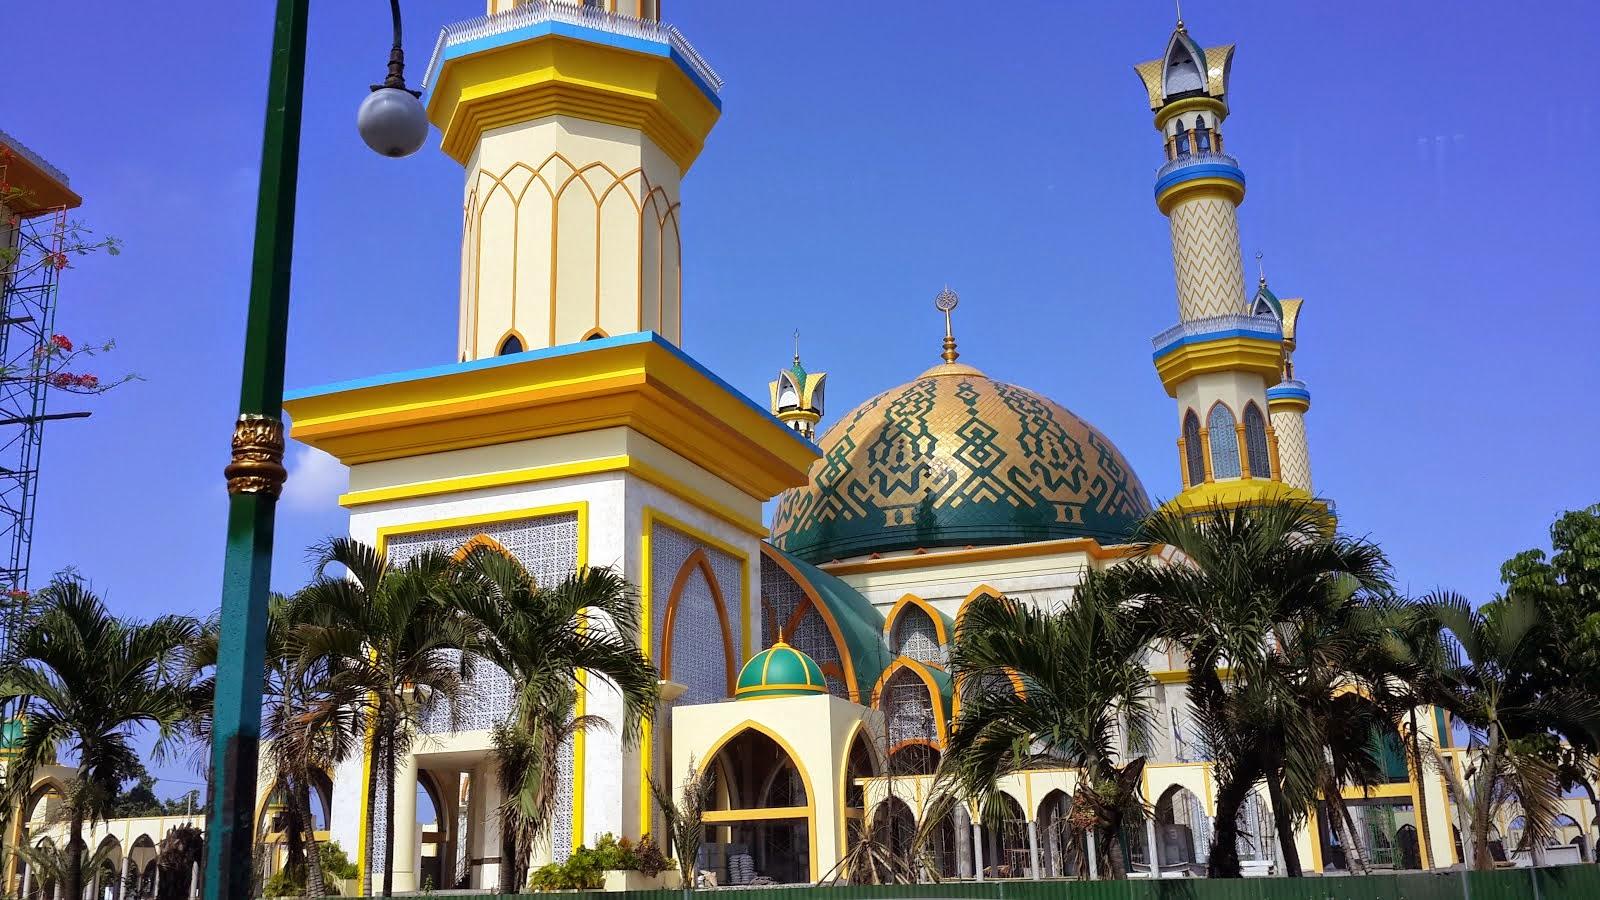 Masjid Raya Mataram